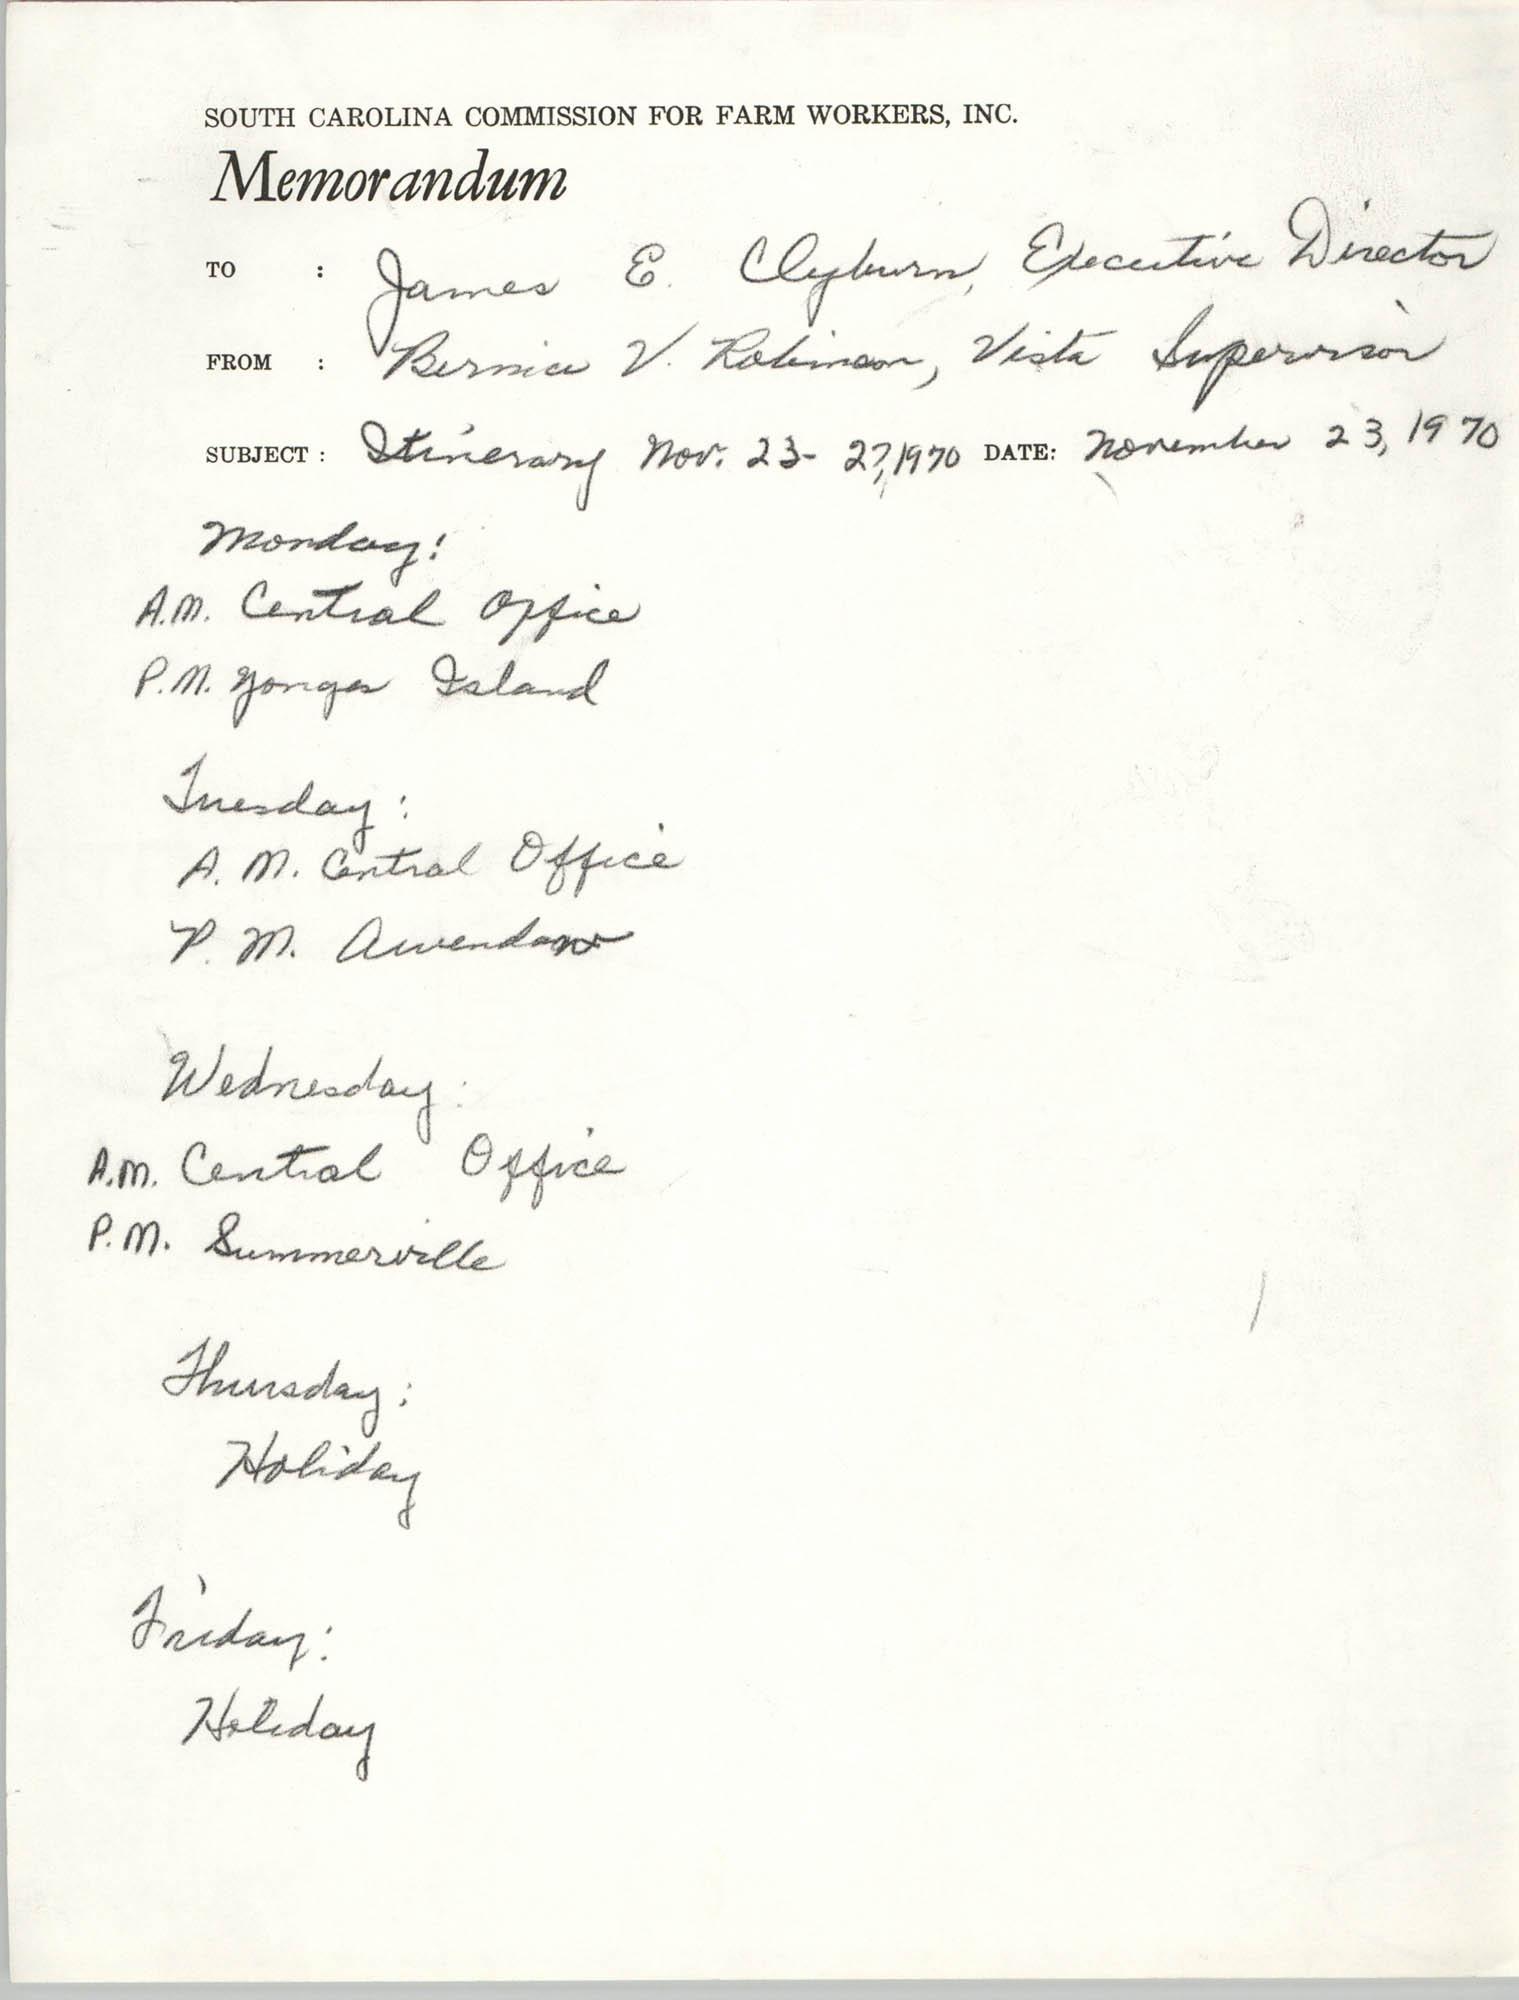 Memorandum from Bernice V. Robinson to James E. Clyburn, November 23, 1970